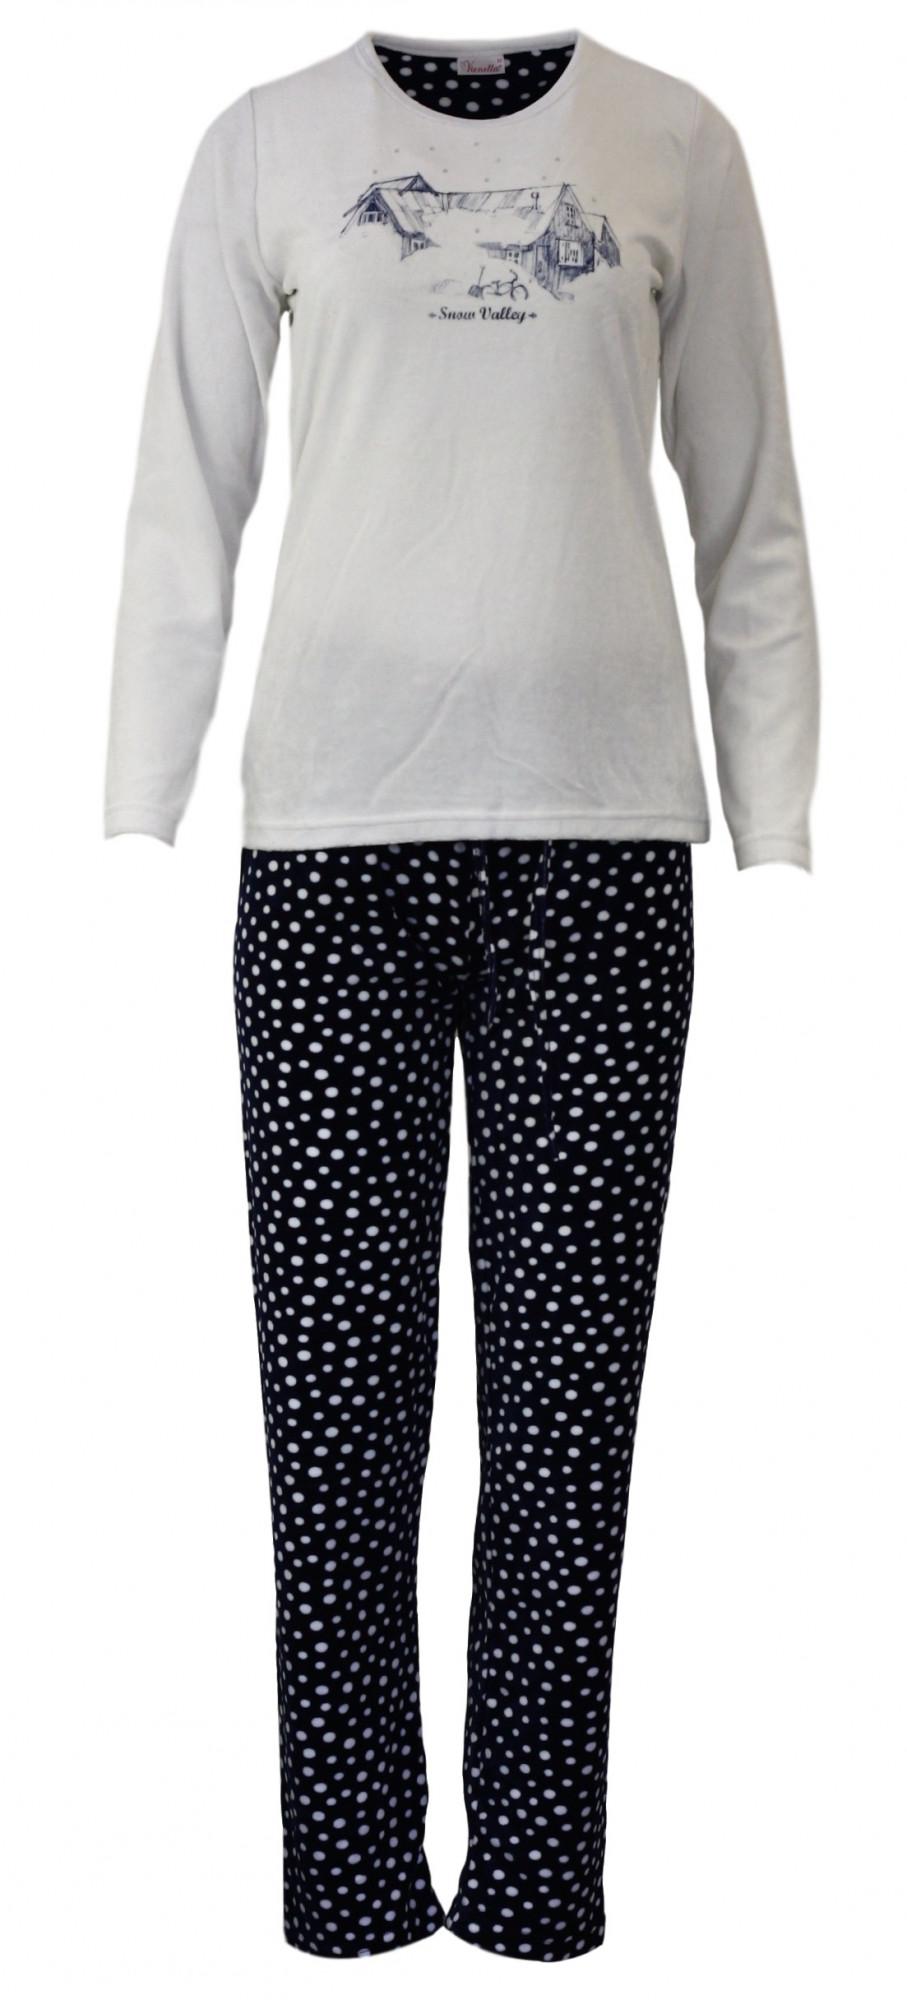 Dámské pyžamo 4419 - Vienetta Barva: bílá, Velikost: M